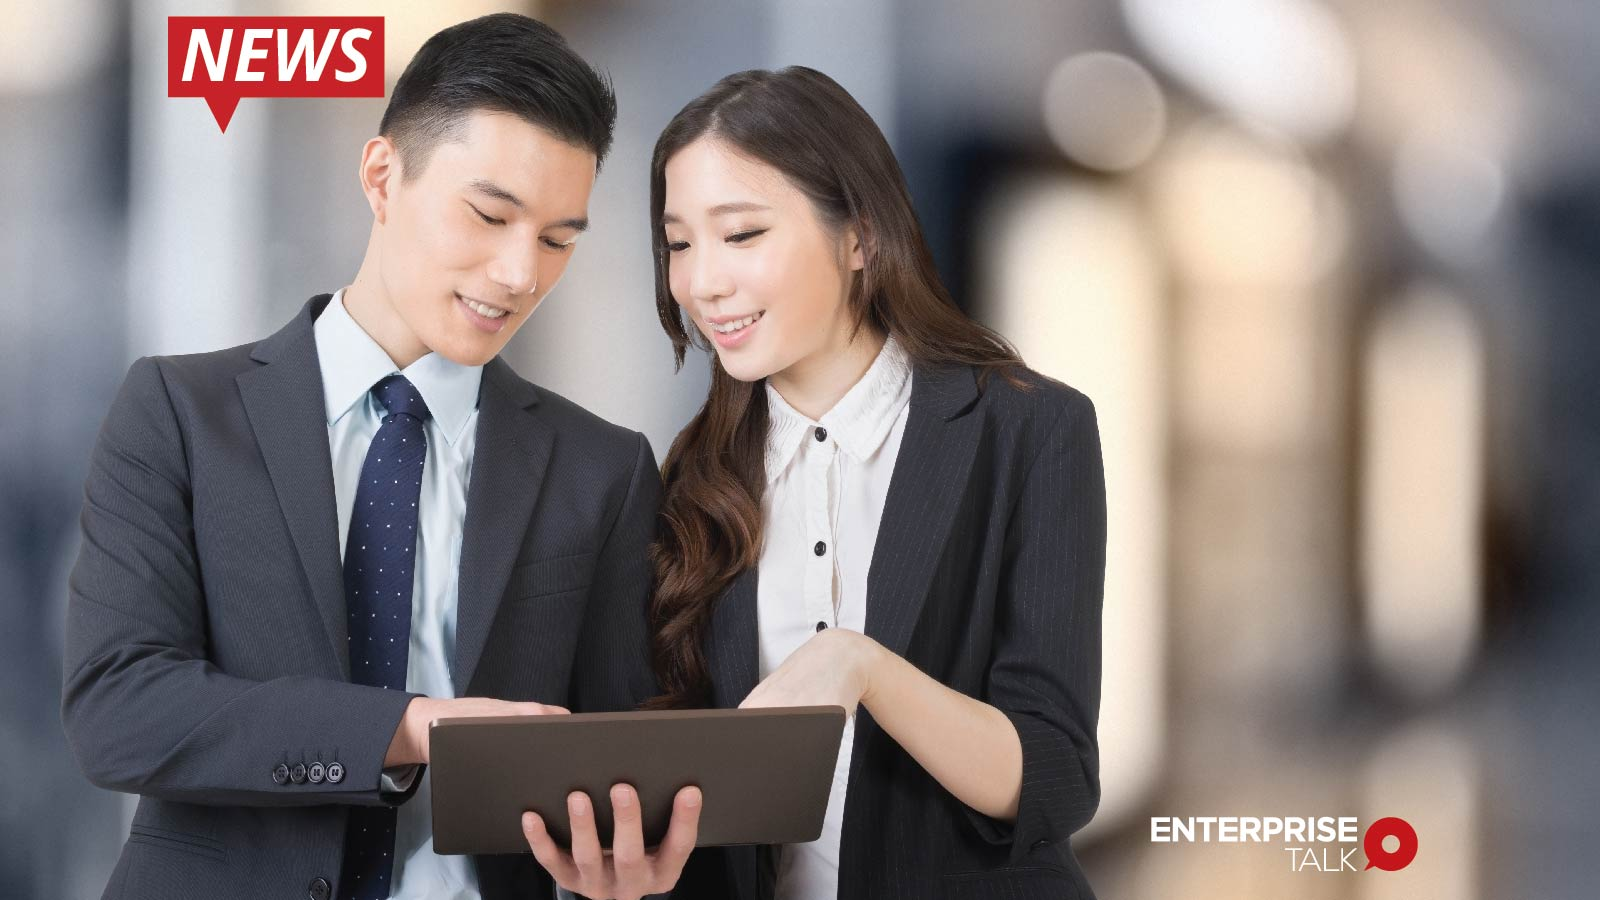 Adapdix appoints Jean Lau as CTO to lead world-class Edge AI technology team